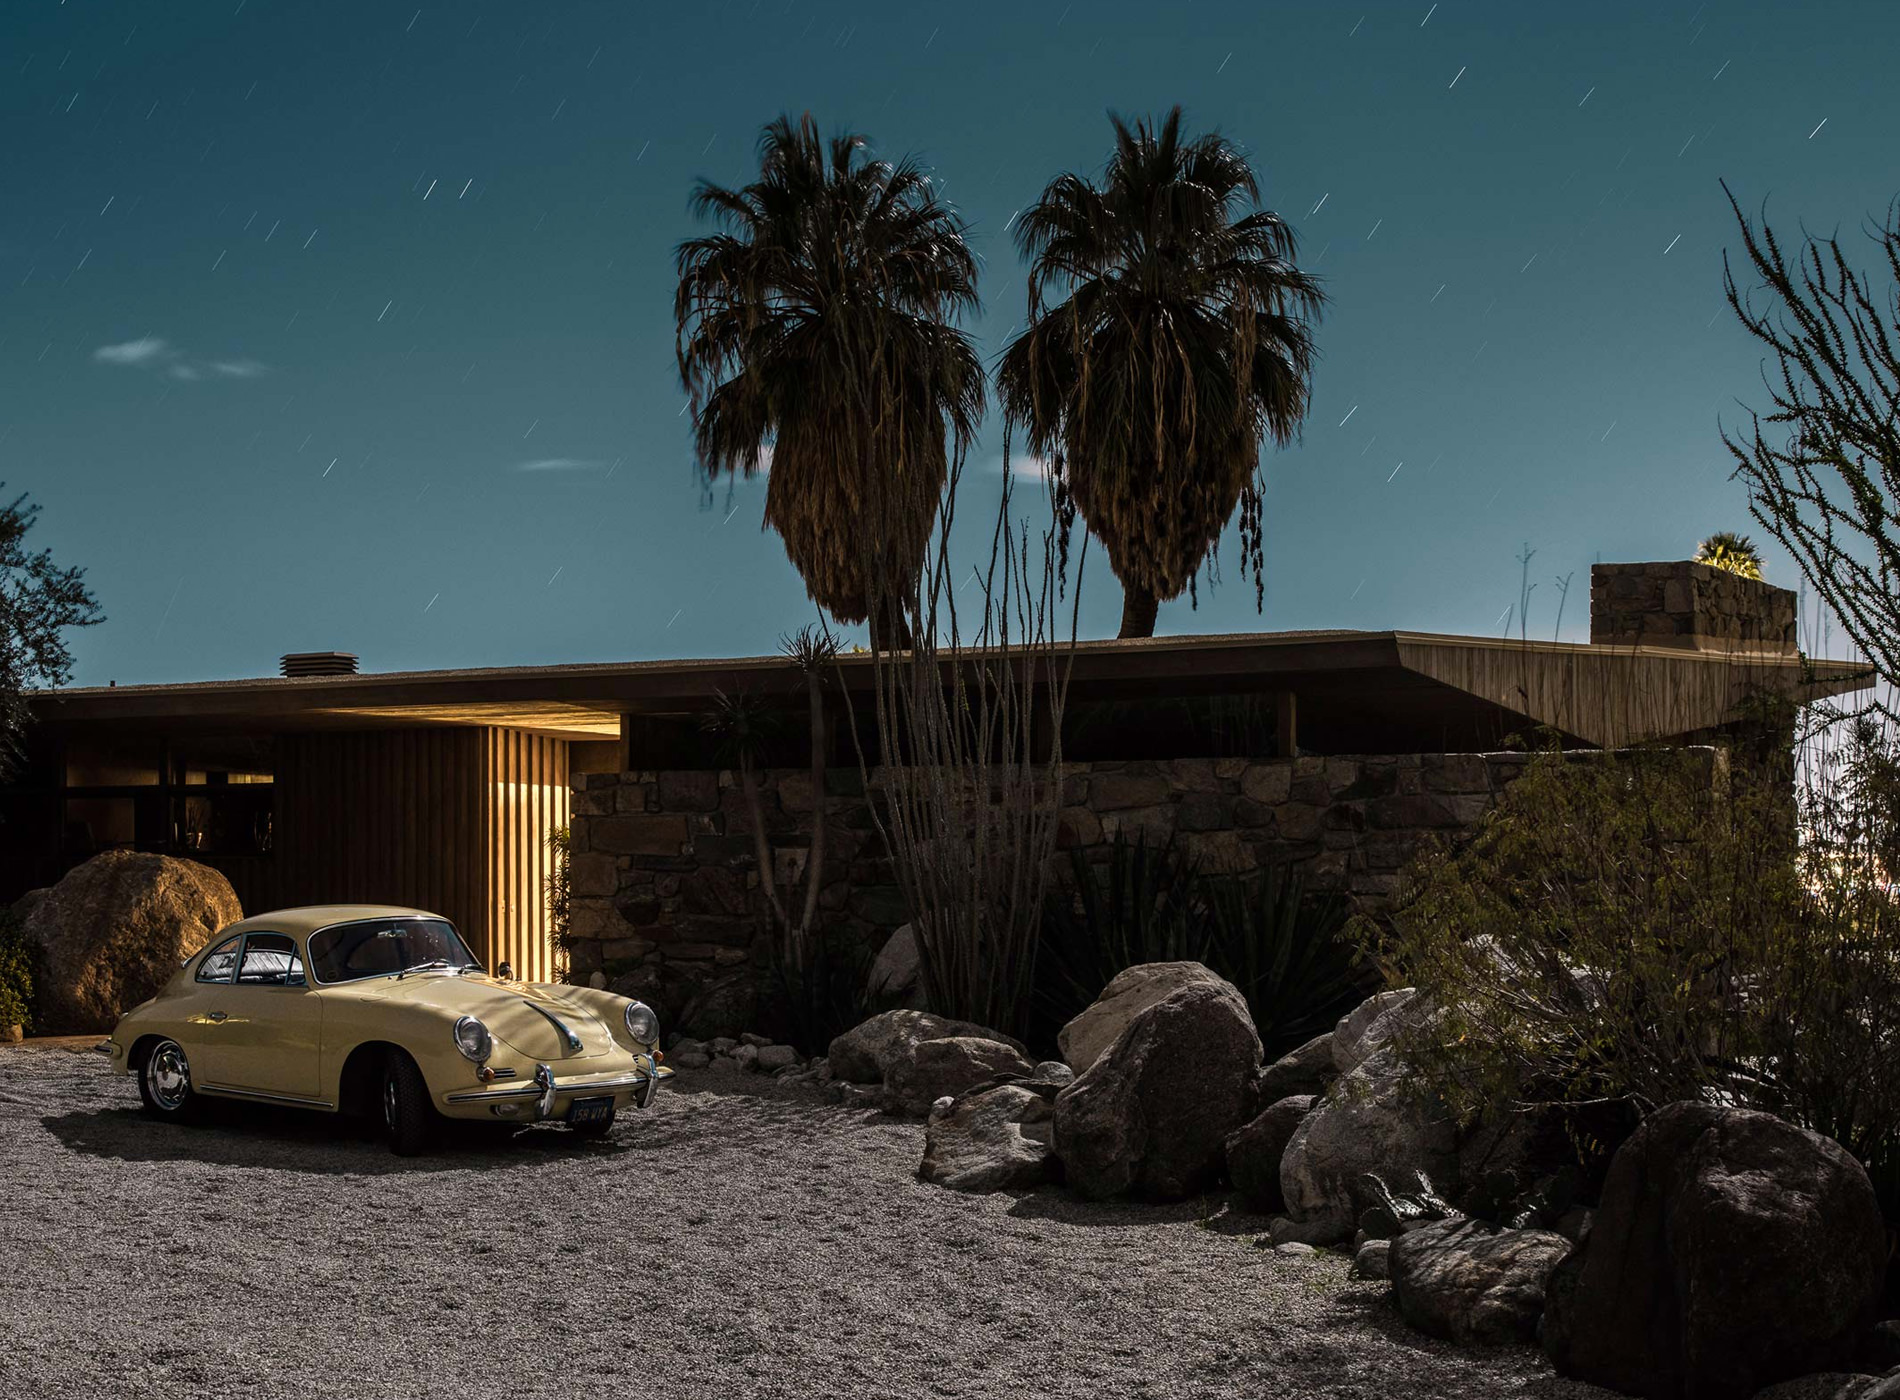 Midnight Modern Tom Blachford Série Photographique